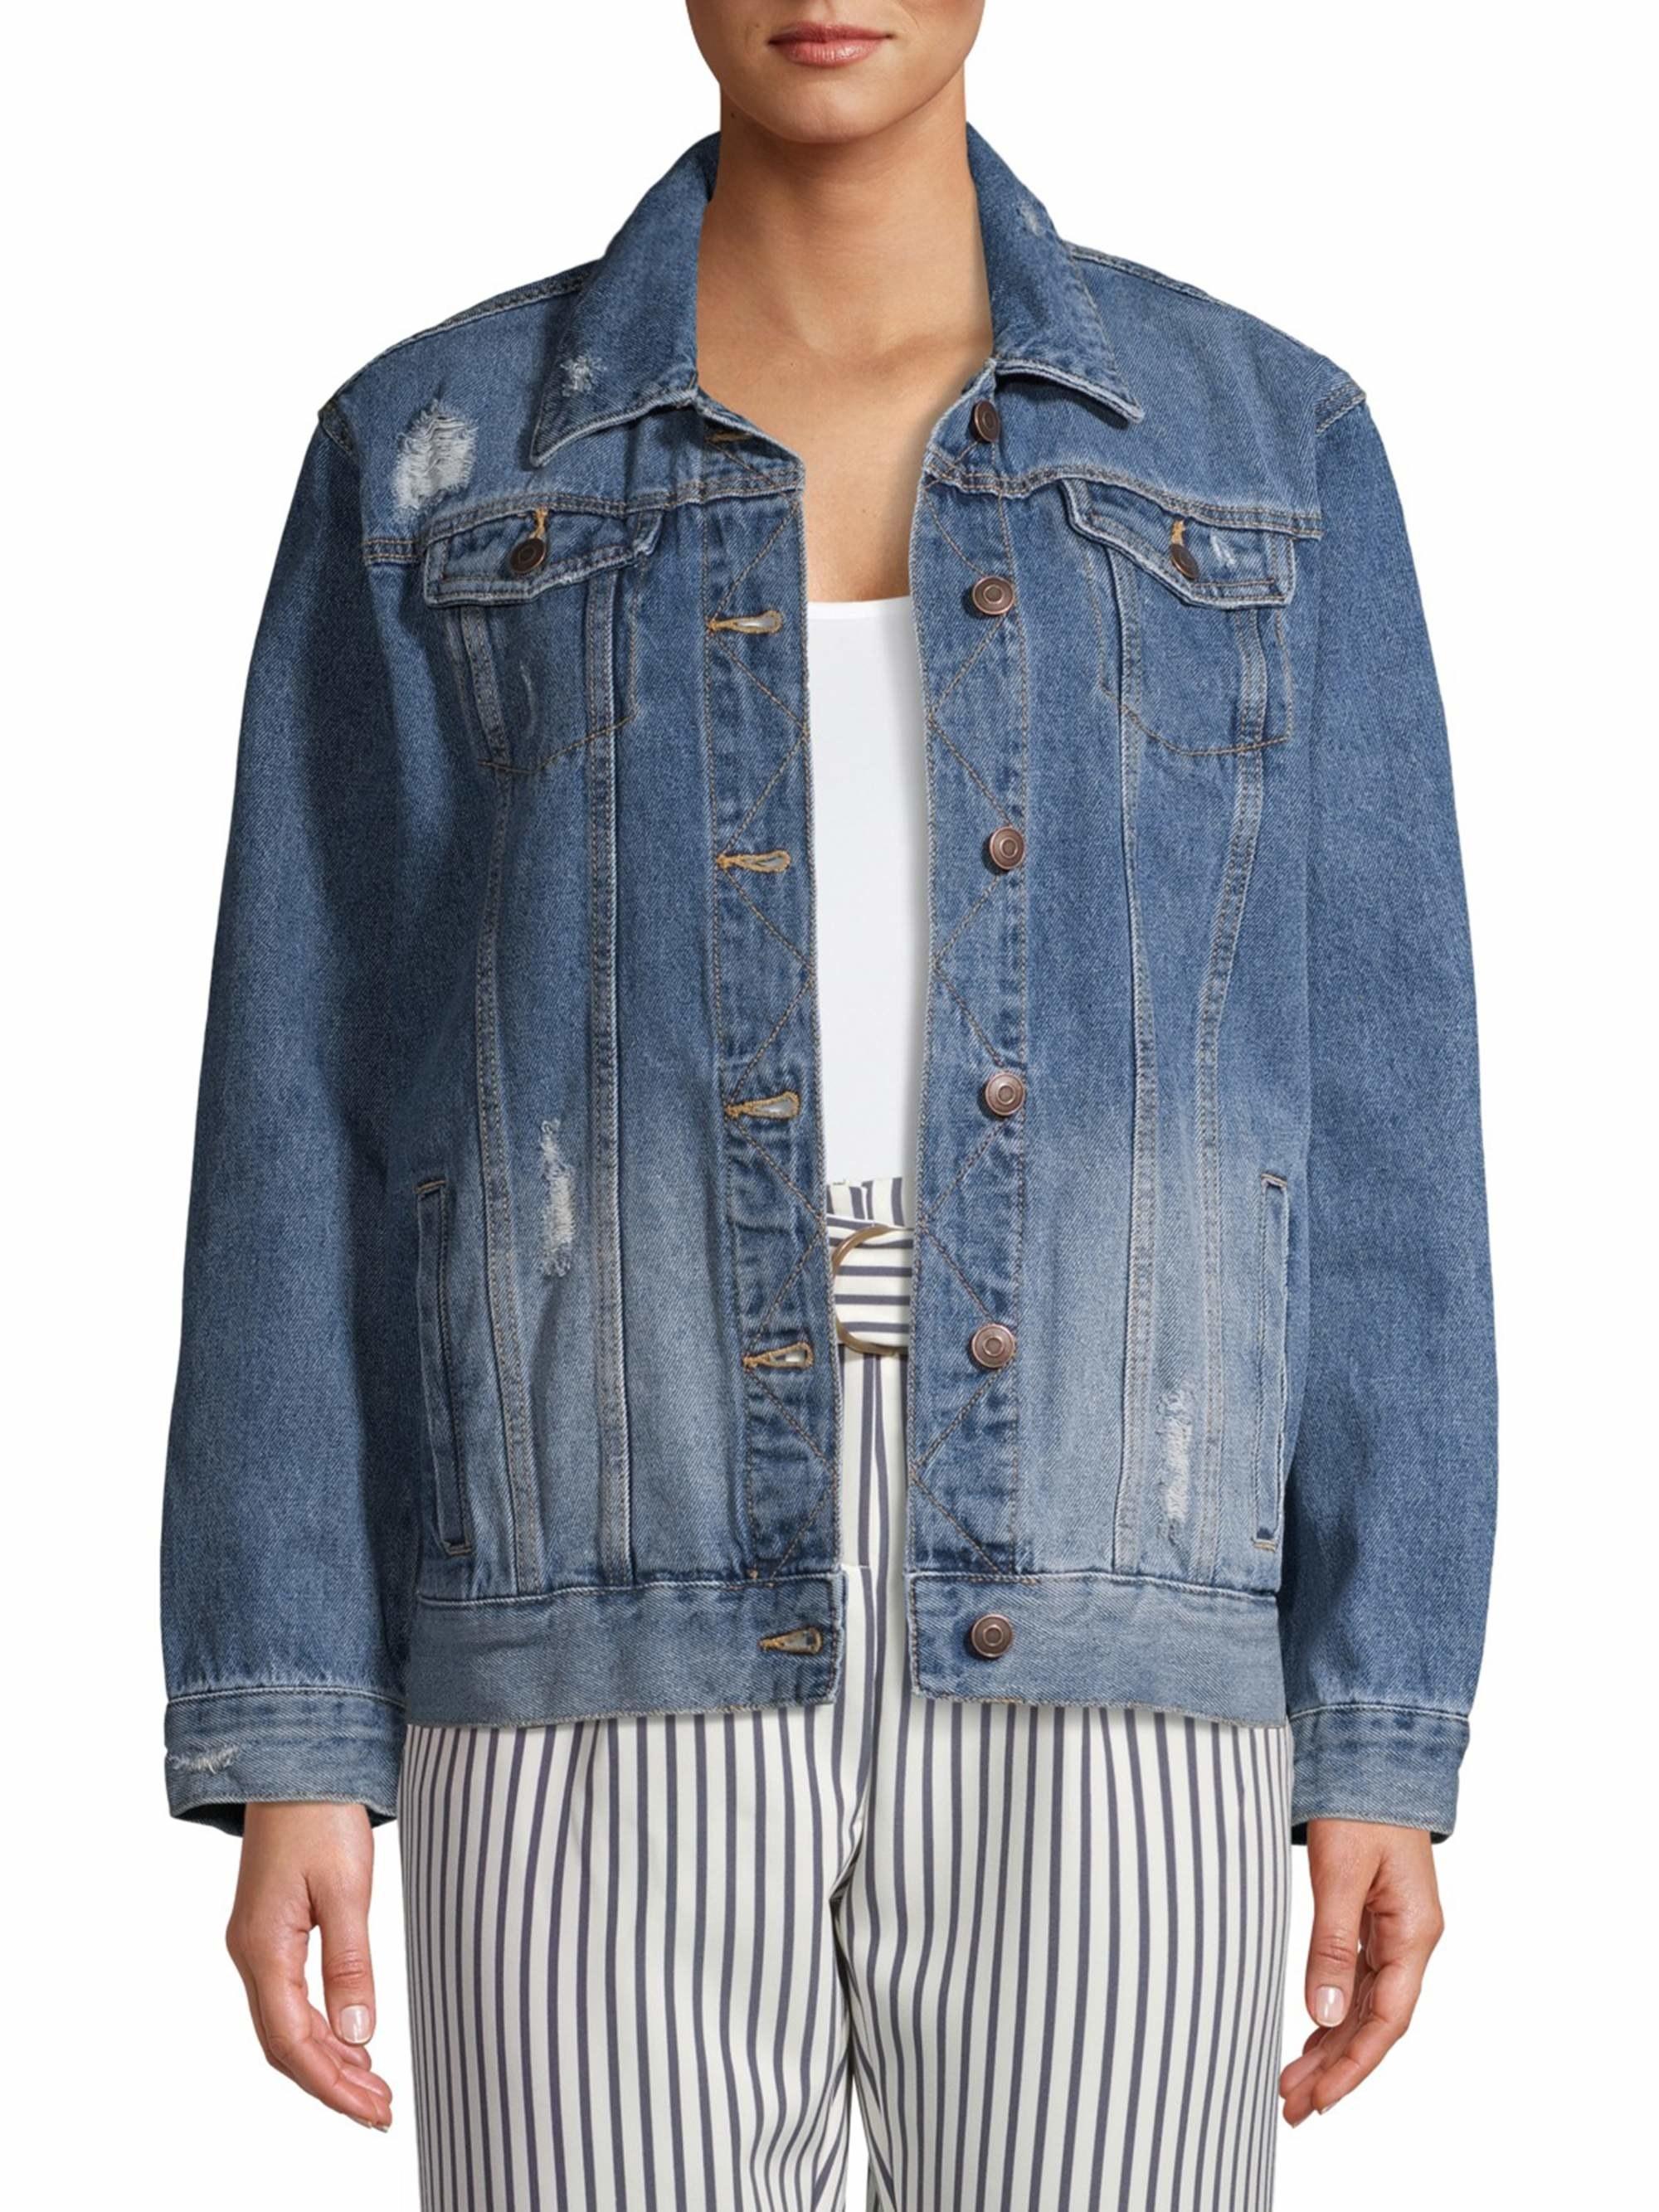 Model wears slightly distressed denim jacket